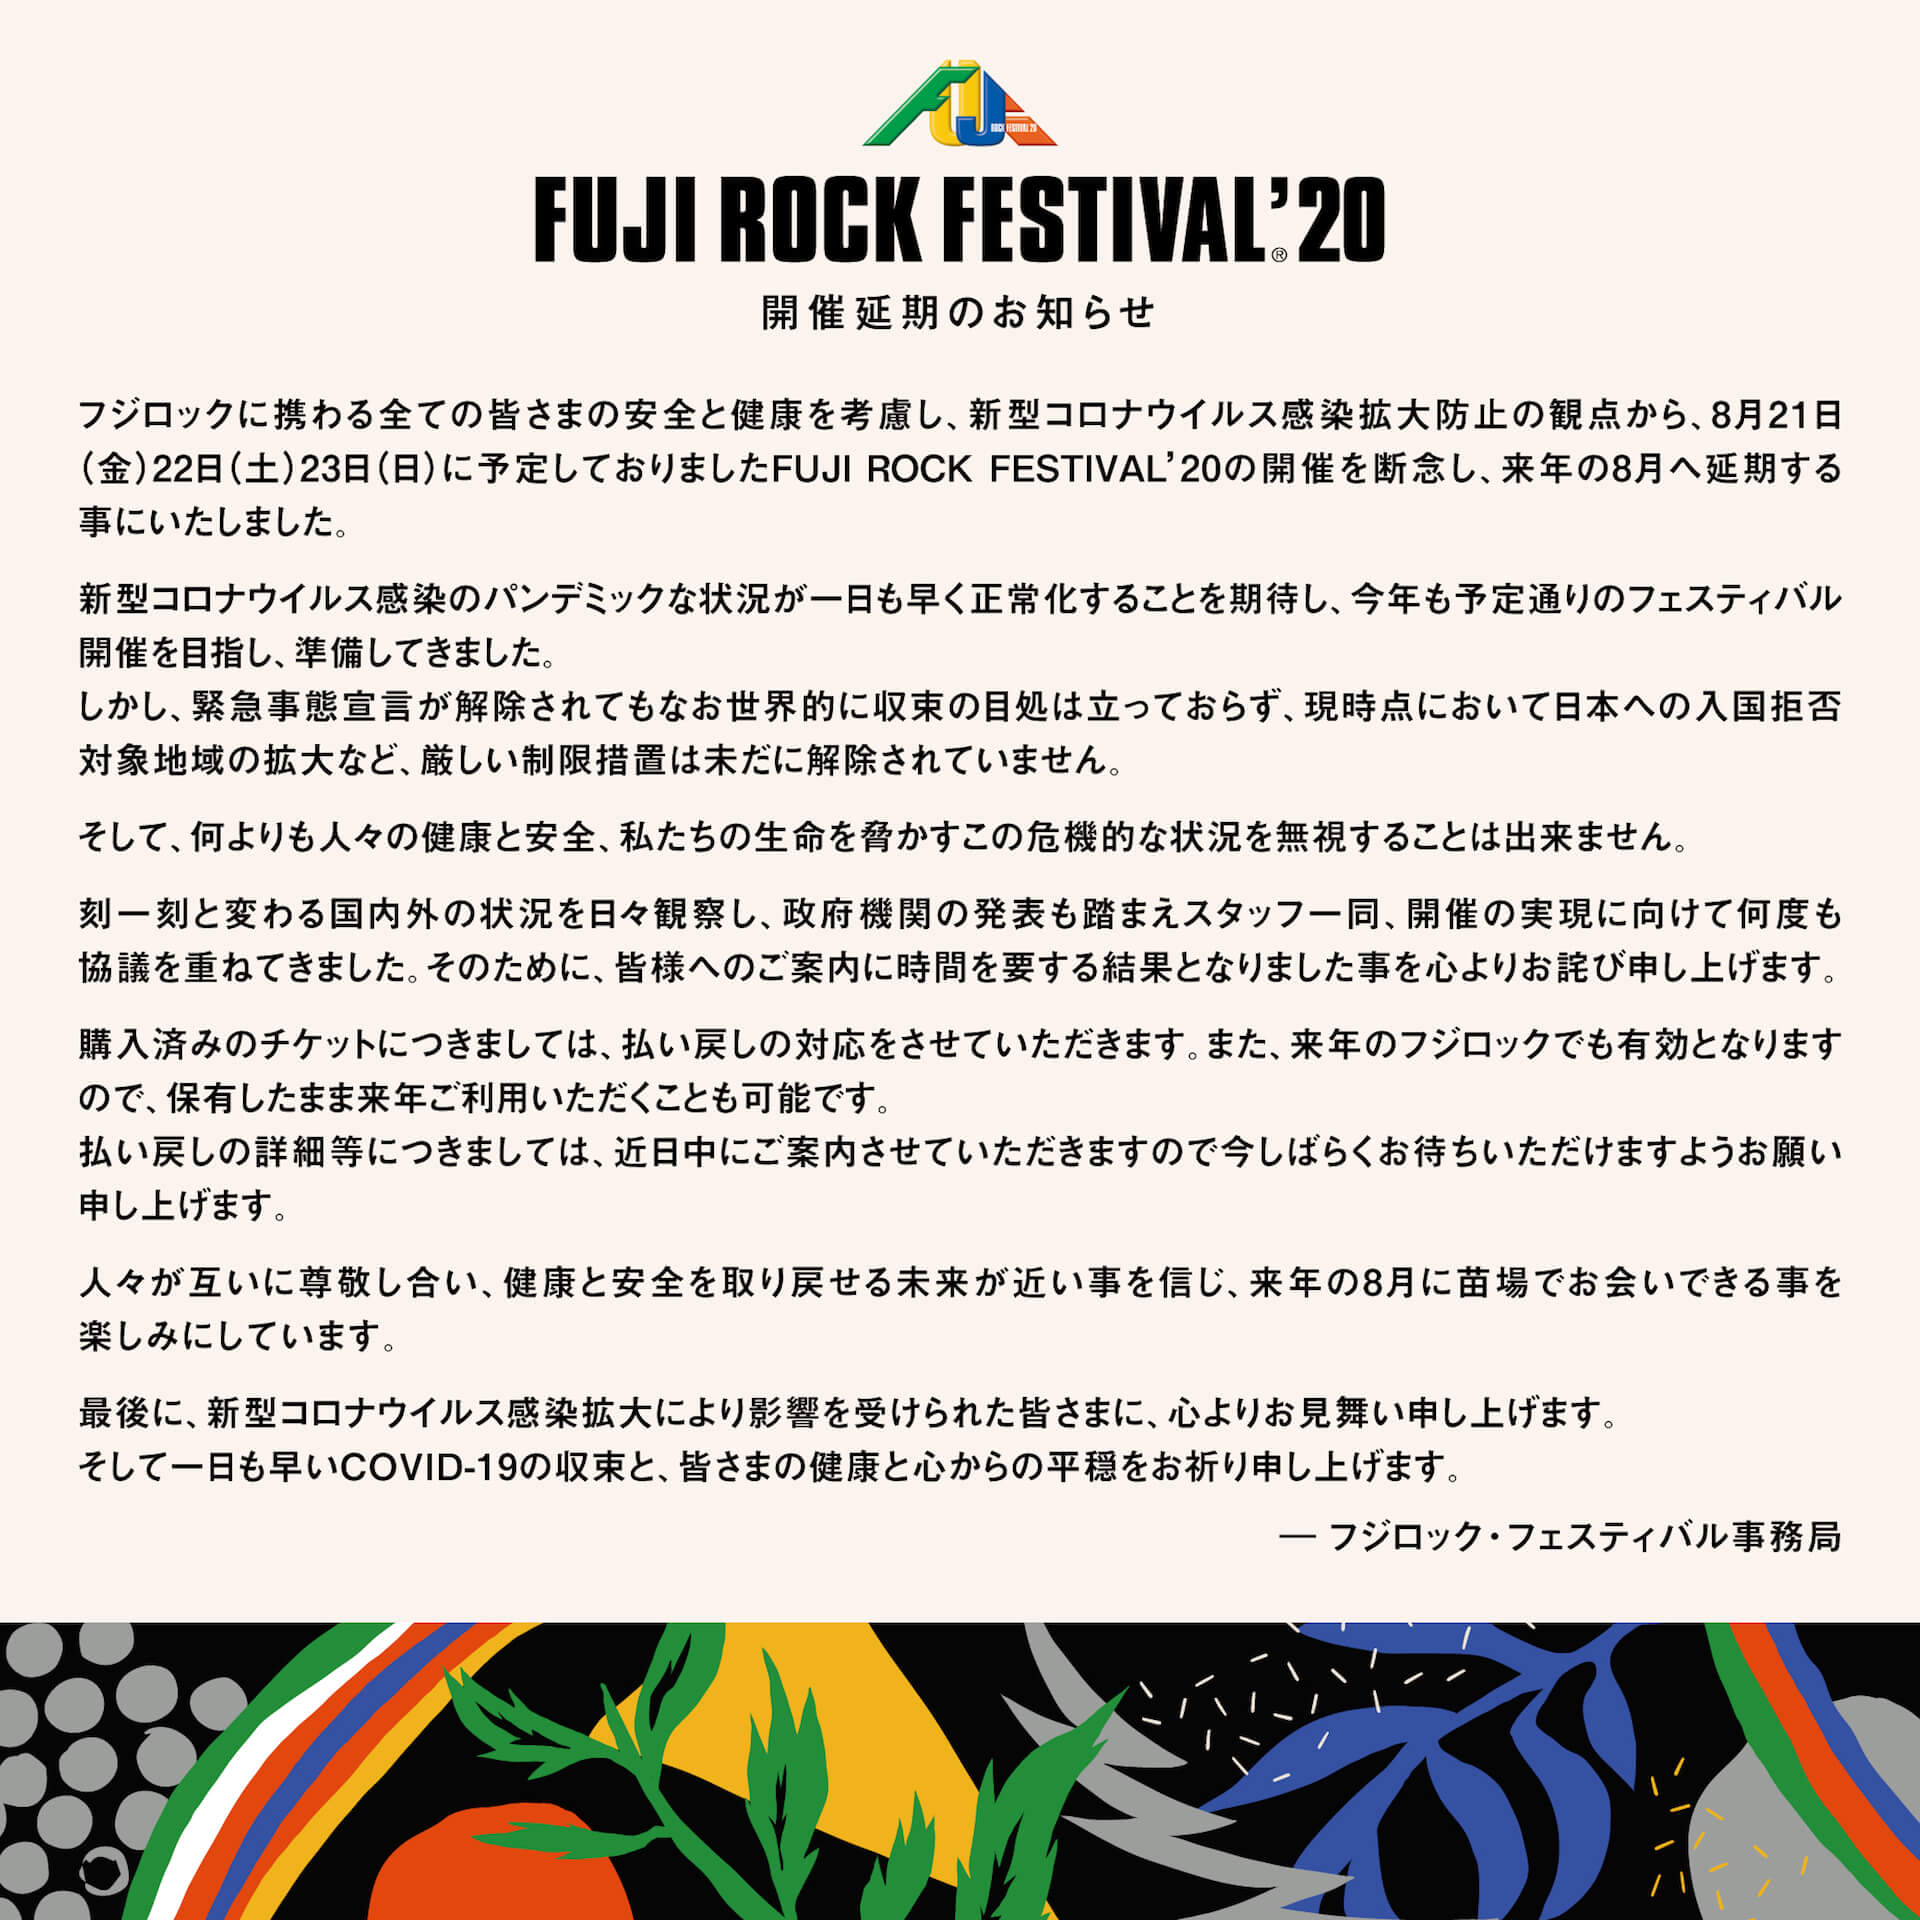 <FUJI ROCK FESTIVAL '20>、2021年に開催延期が決定|今年のチケットは来年も有効「来年の8月に苗場で」 music200605_fujirockfestival_1